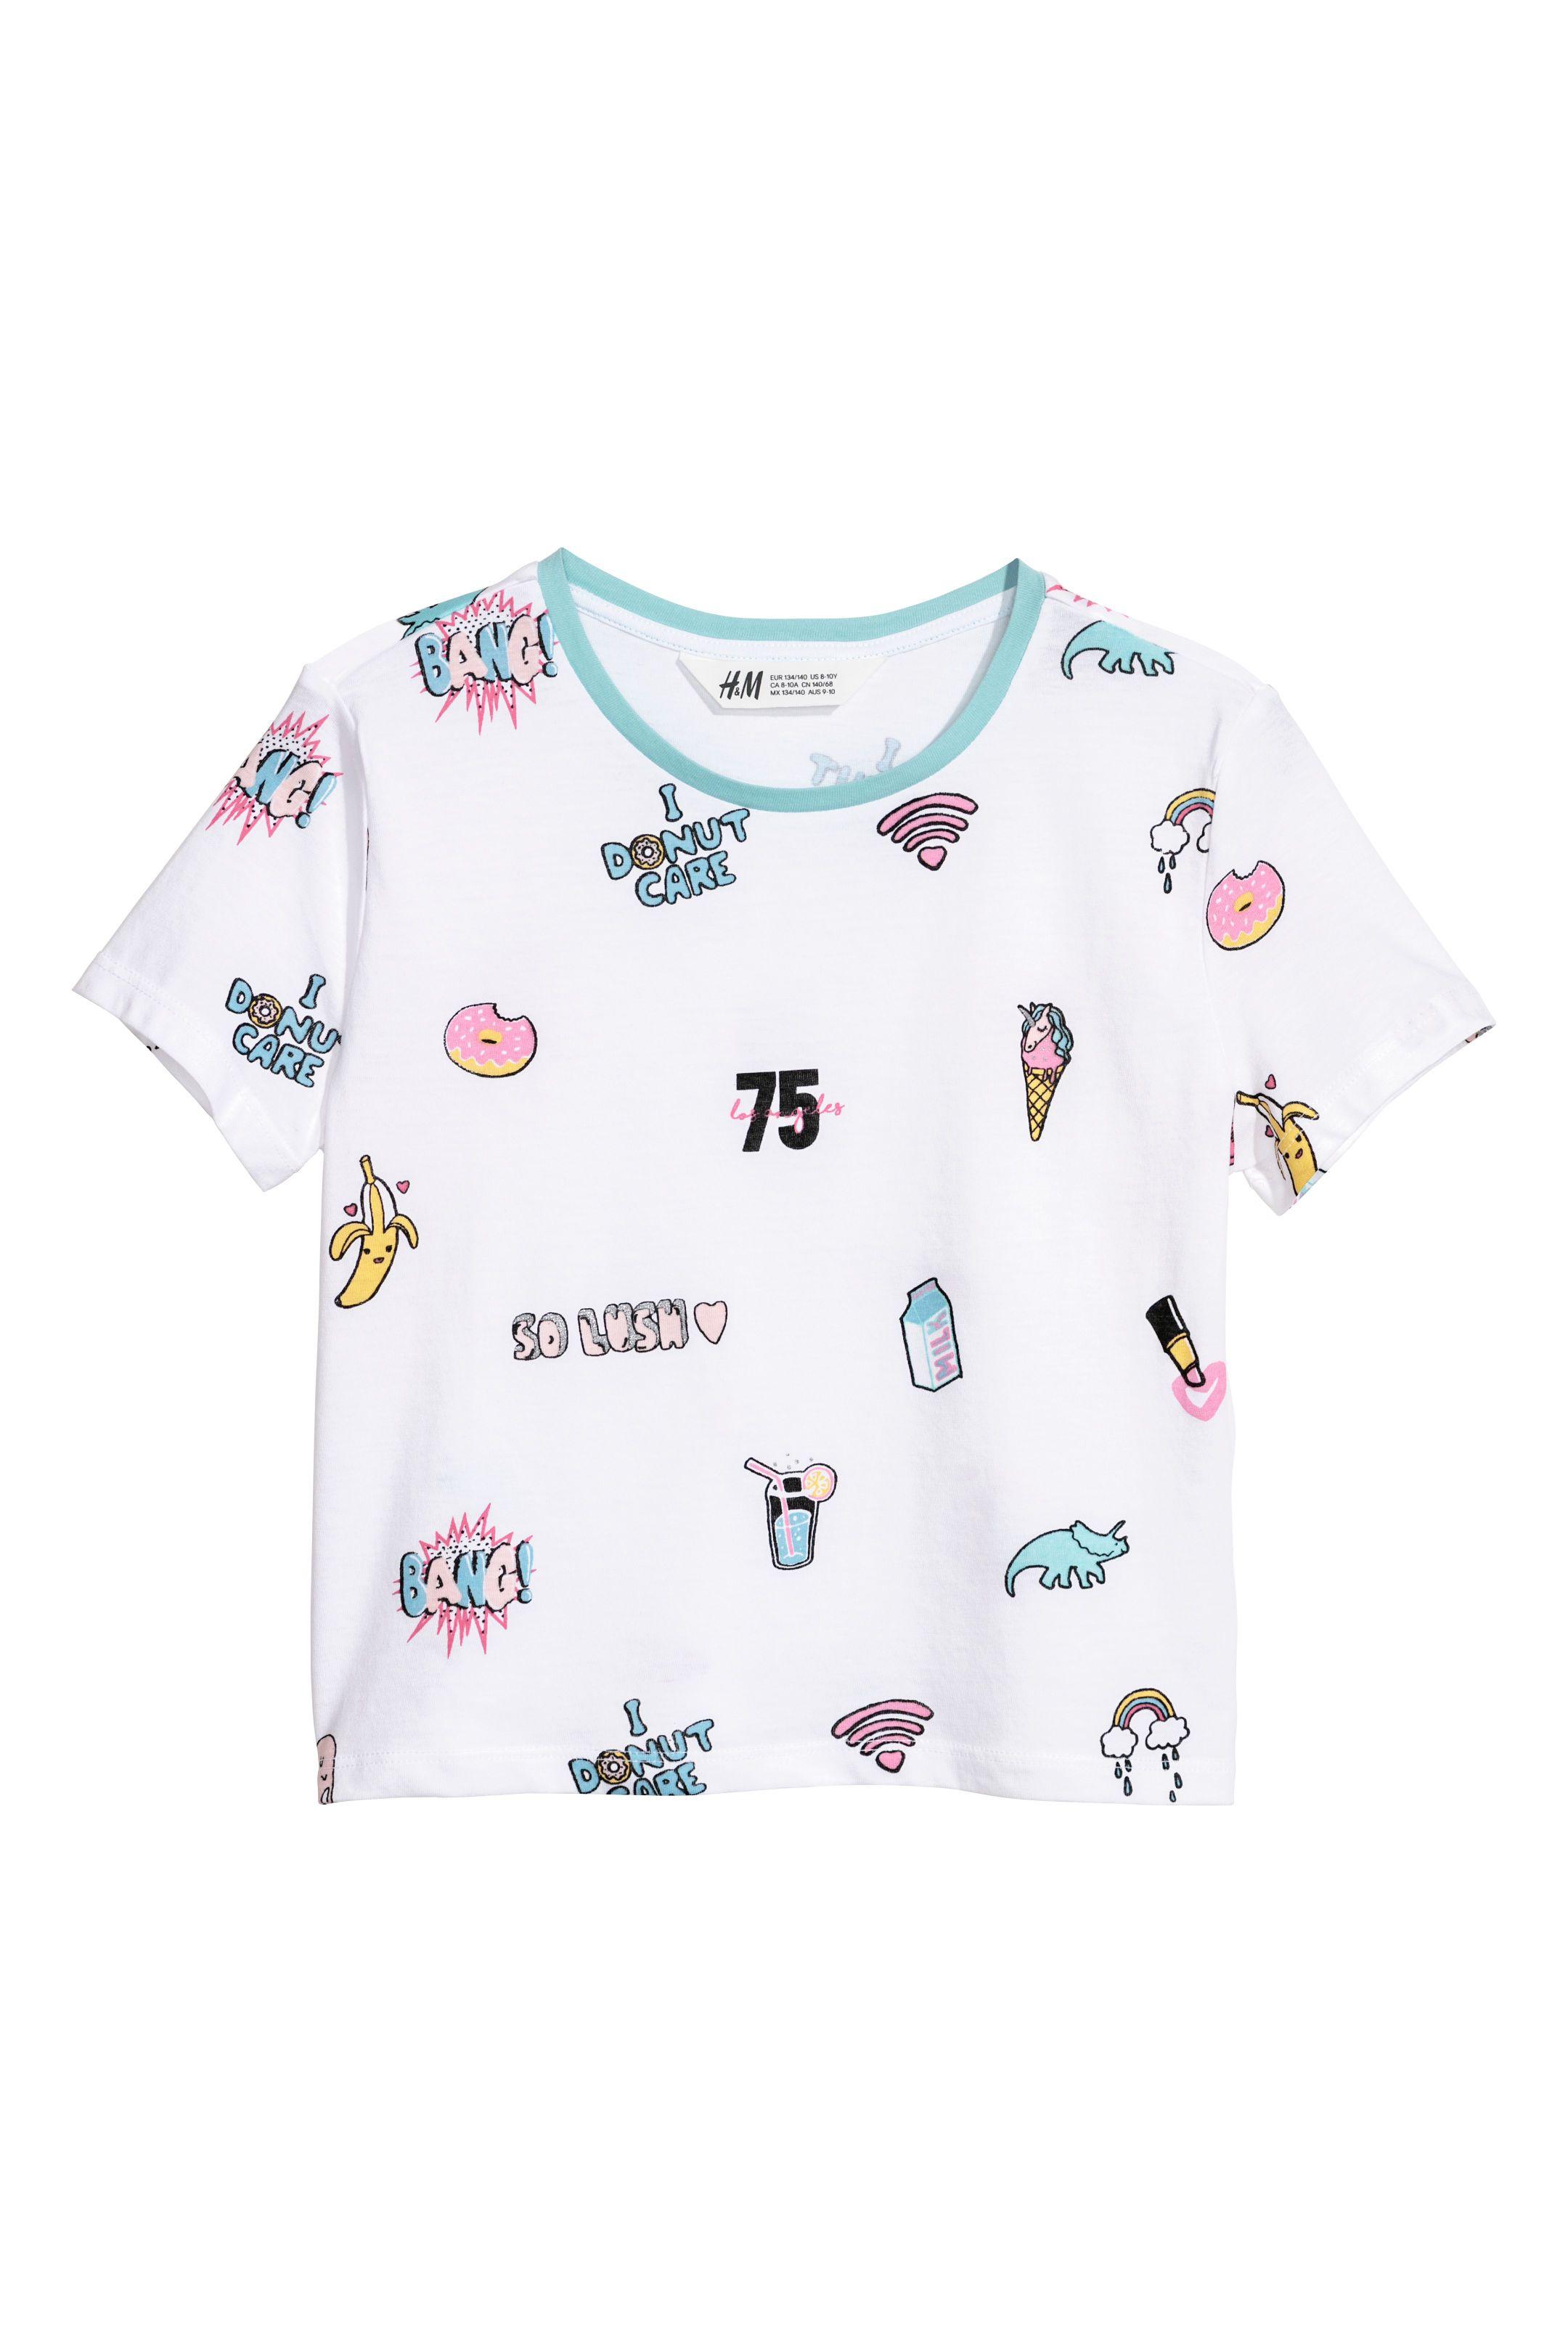 9d994505847 Printed T-shirt in 2019 | يهبلون | H&m, Shirt shop, H&m kids